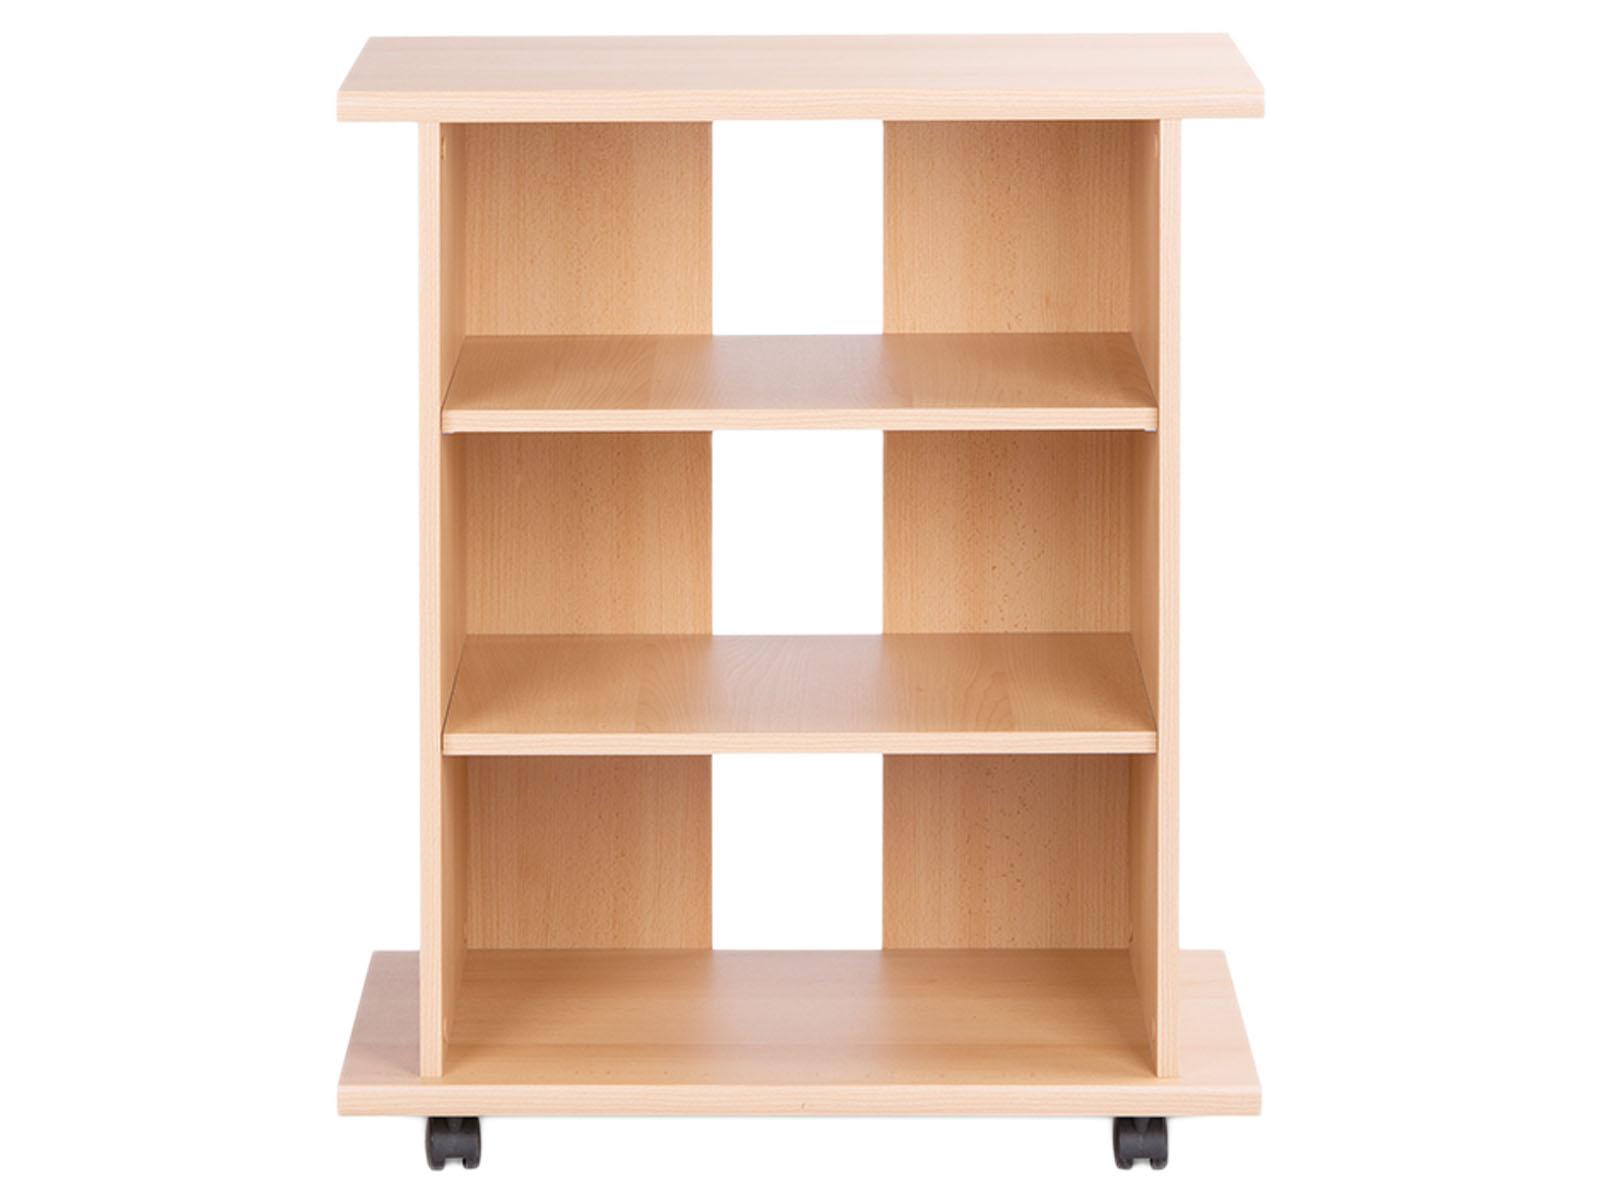 couchtisch arnold 22174020171004. Black Bedroom Furniture Sets. Home Design Ideas